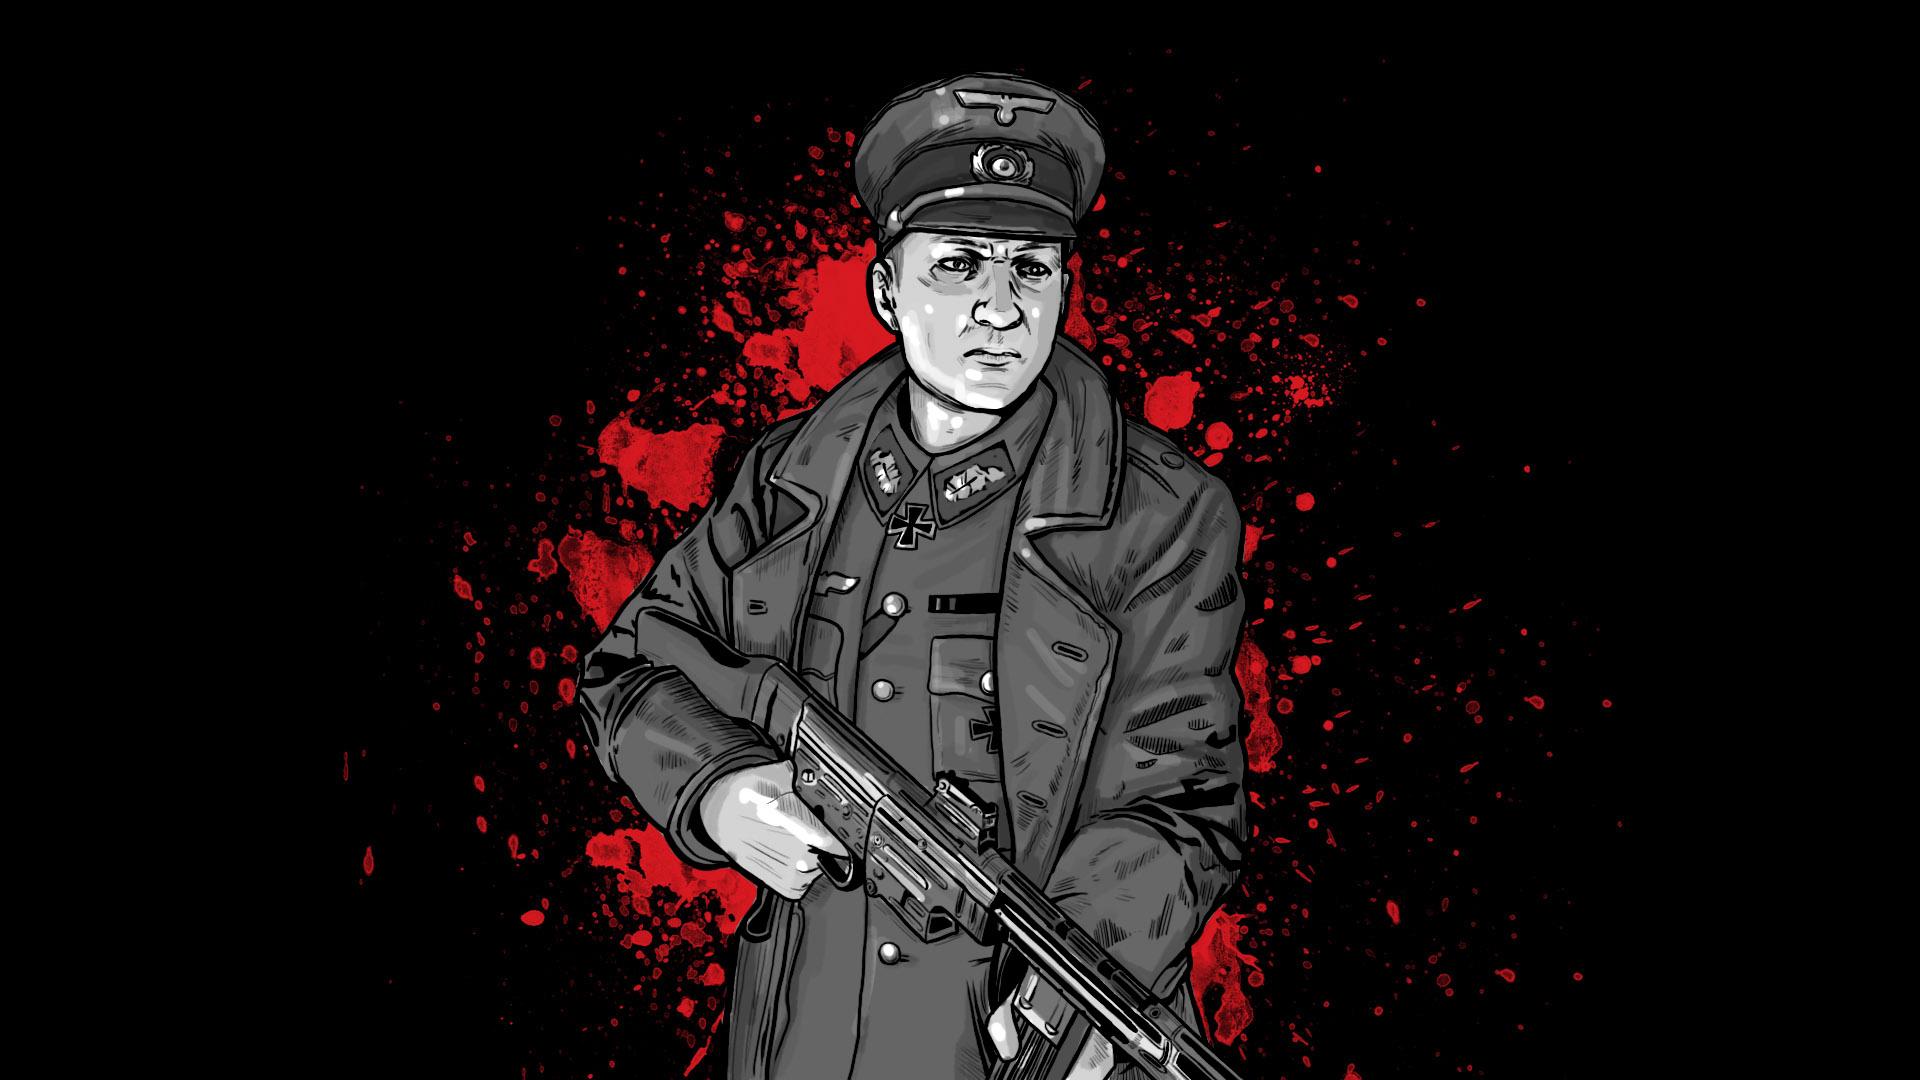 Sniper Elite Nazi Zombie Army Artwork 4.jpg